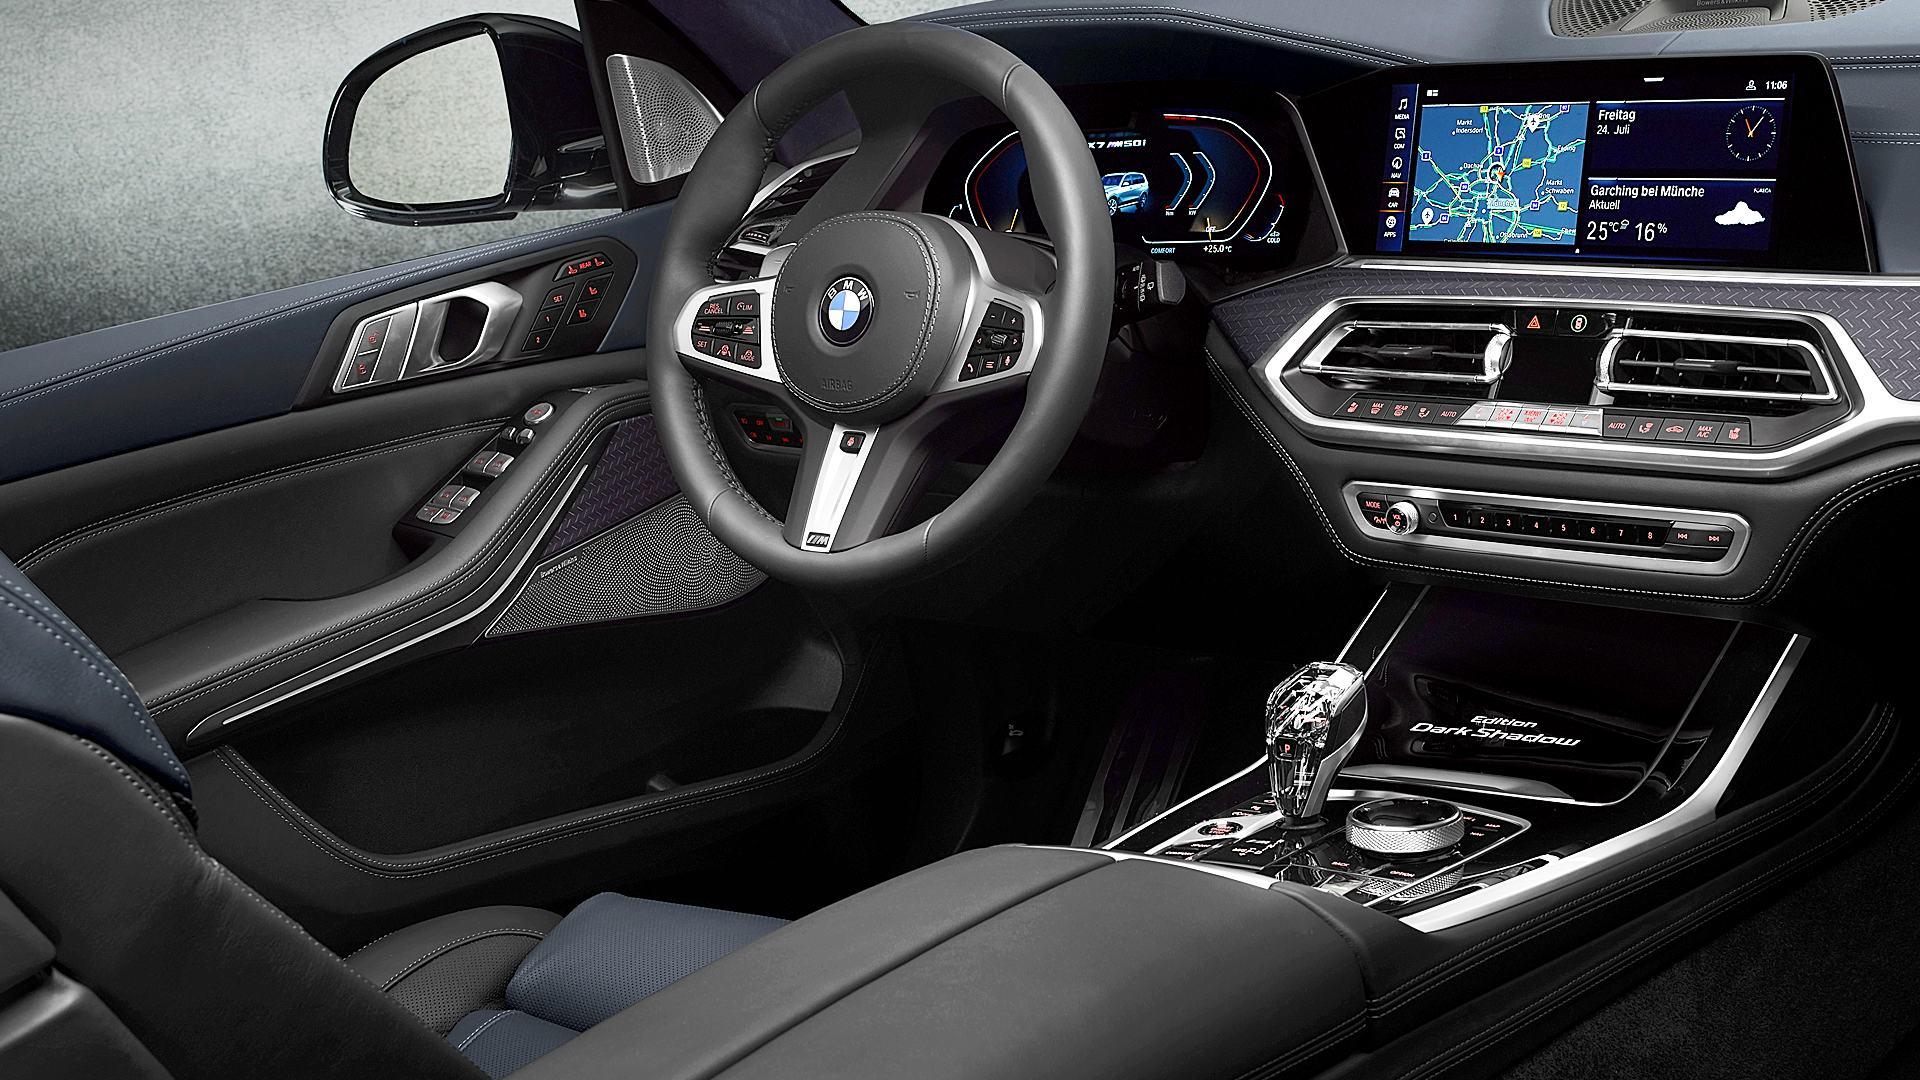 2020 BMW X7 SUV M50i Dark Shadow Edition Interior Inside Pictures